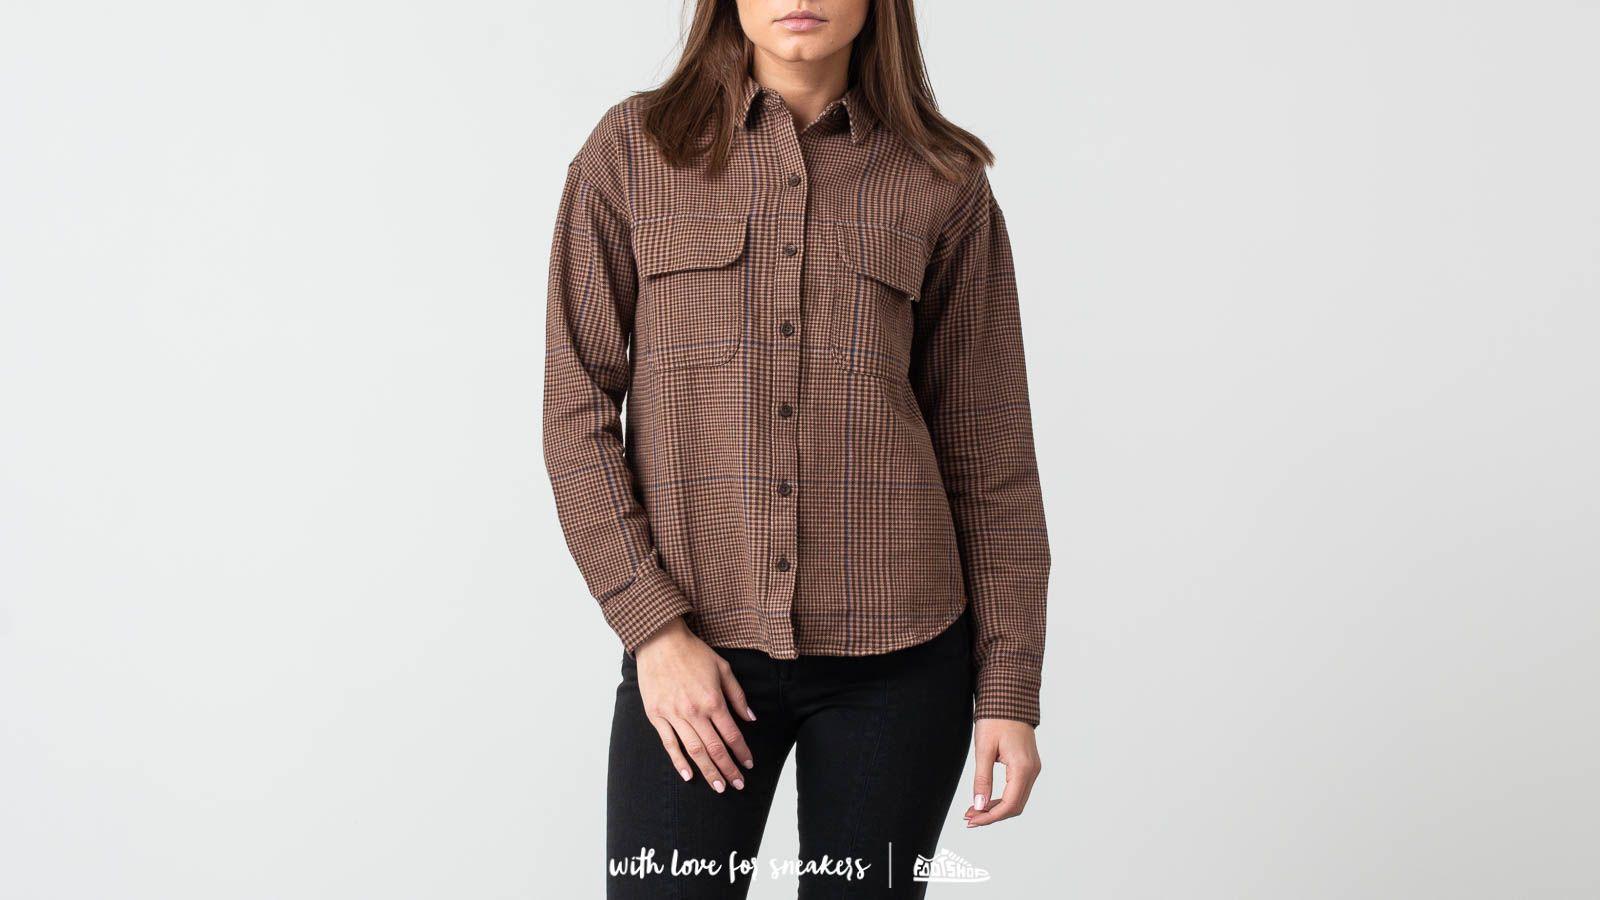 Vans Junction Flannel Shirt Glen Plaid za skvelú cenu 28 € kúpite na Footshop.sk